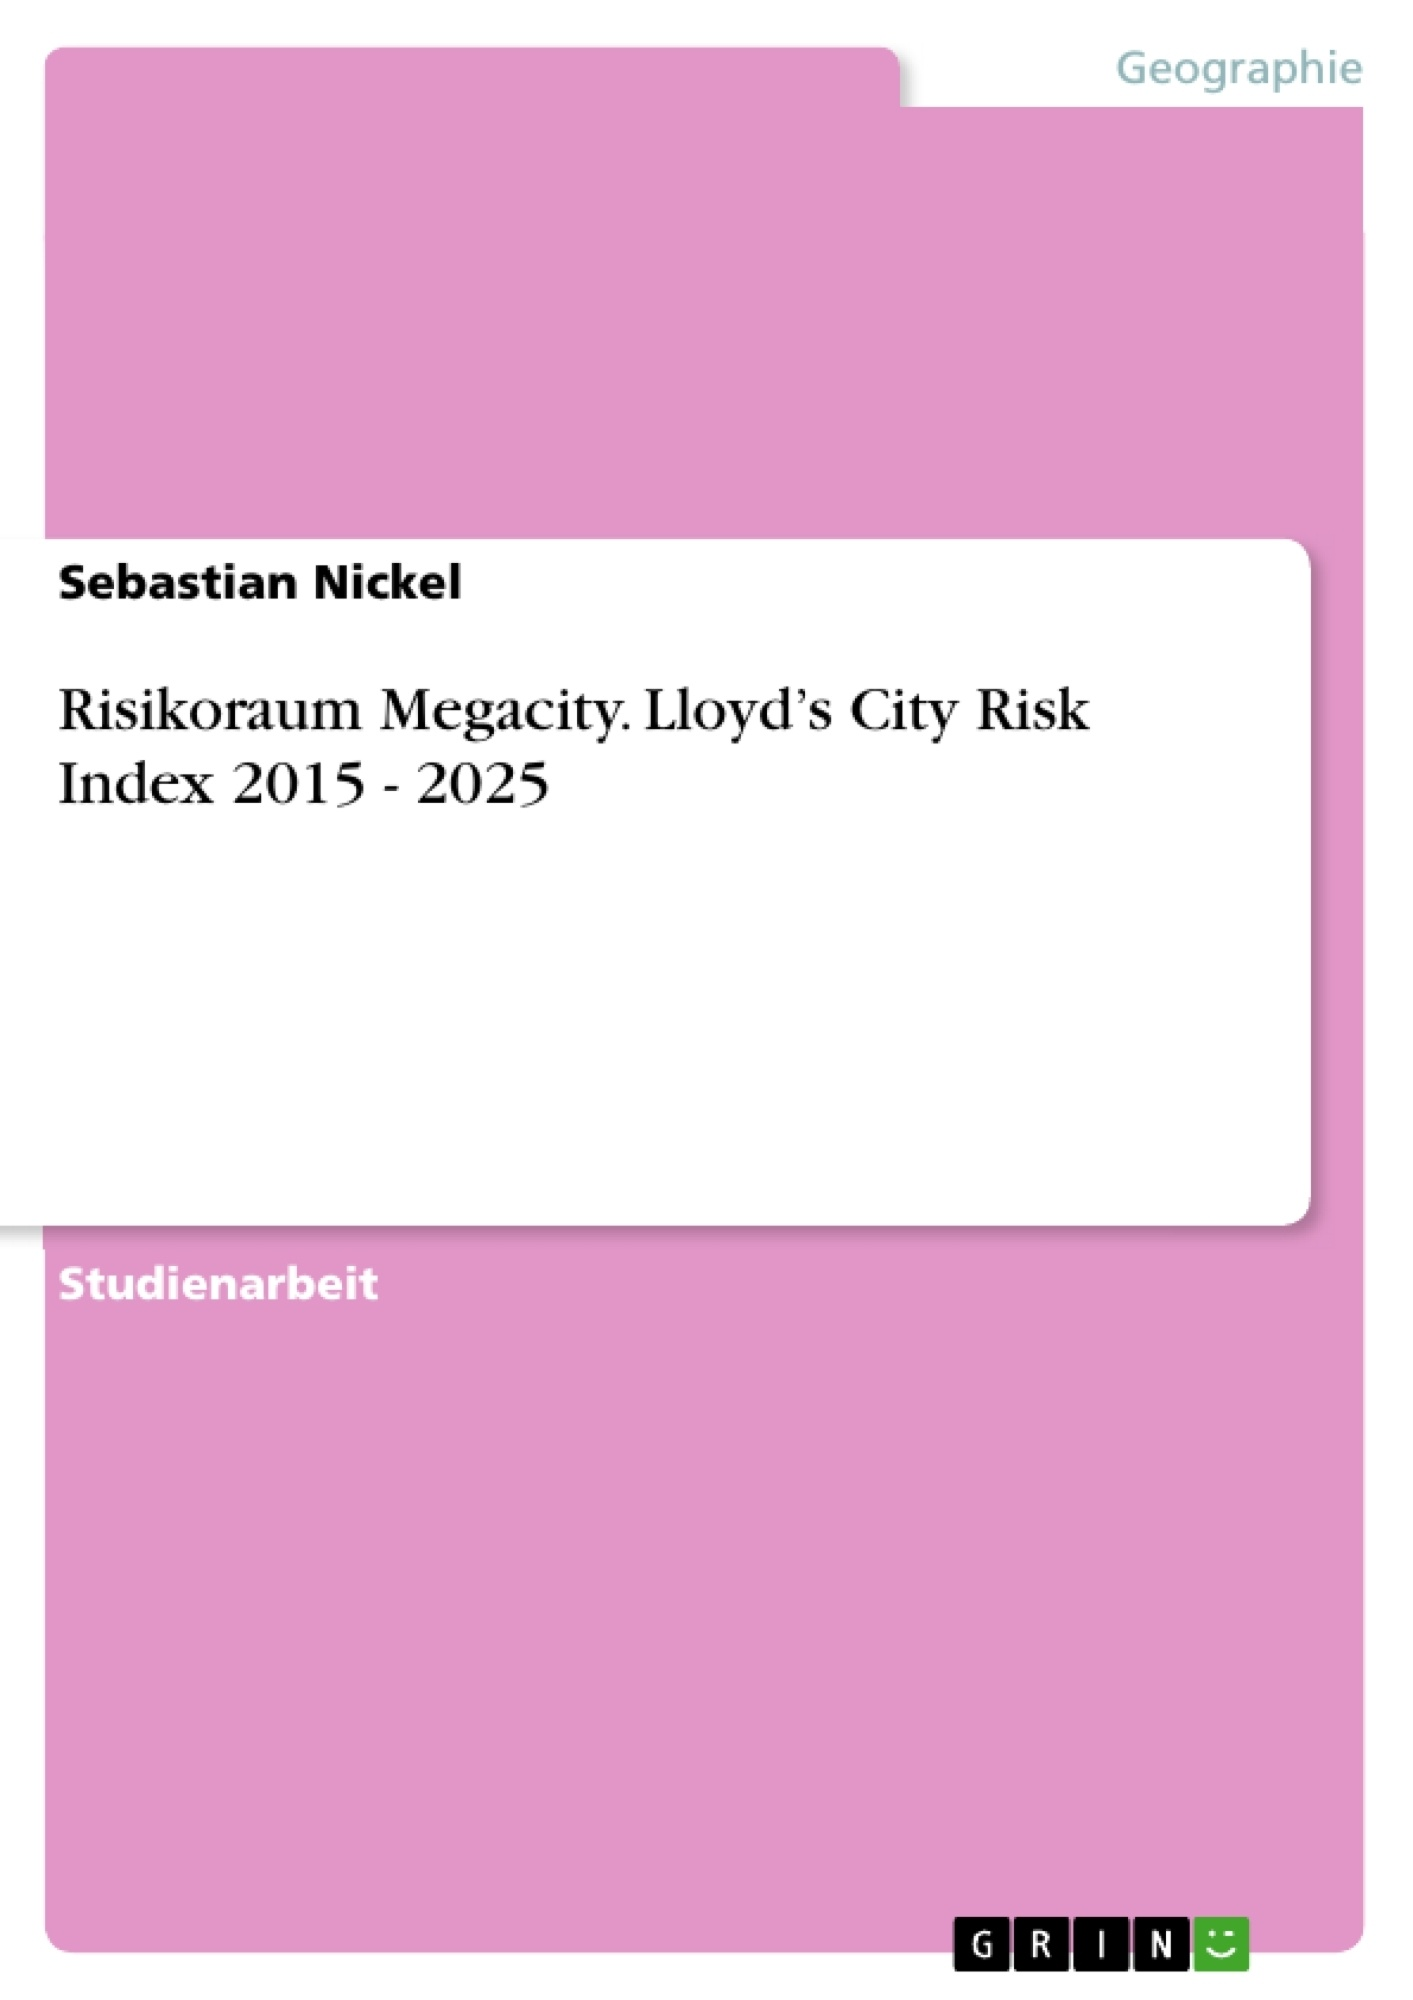 Titel: Risikoraum Megacity. Lloyd's City Risk Index 2015 - 2025